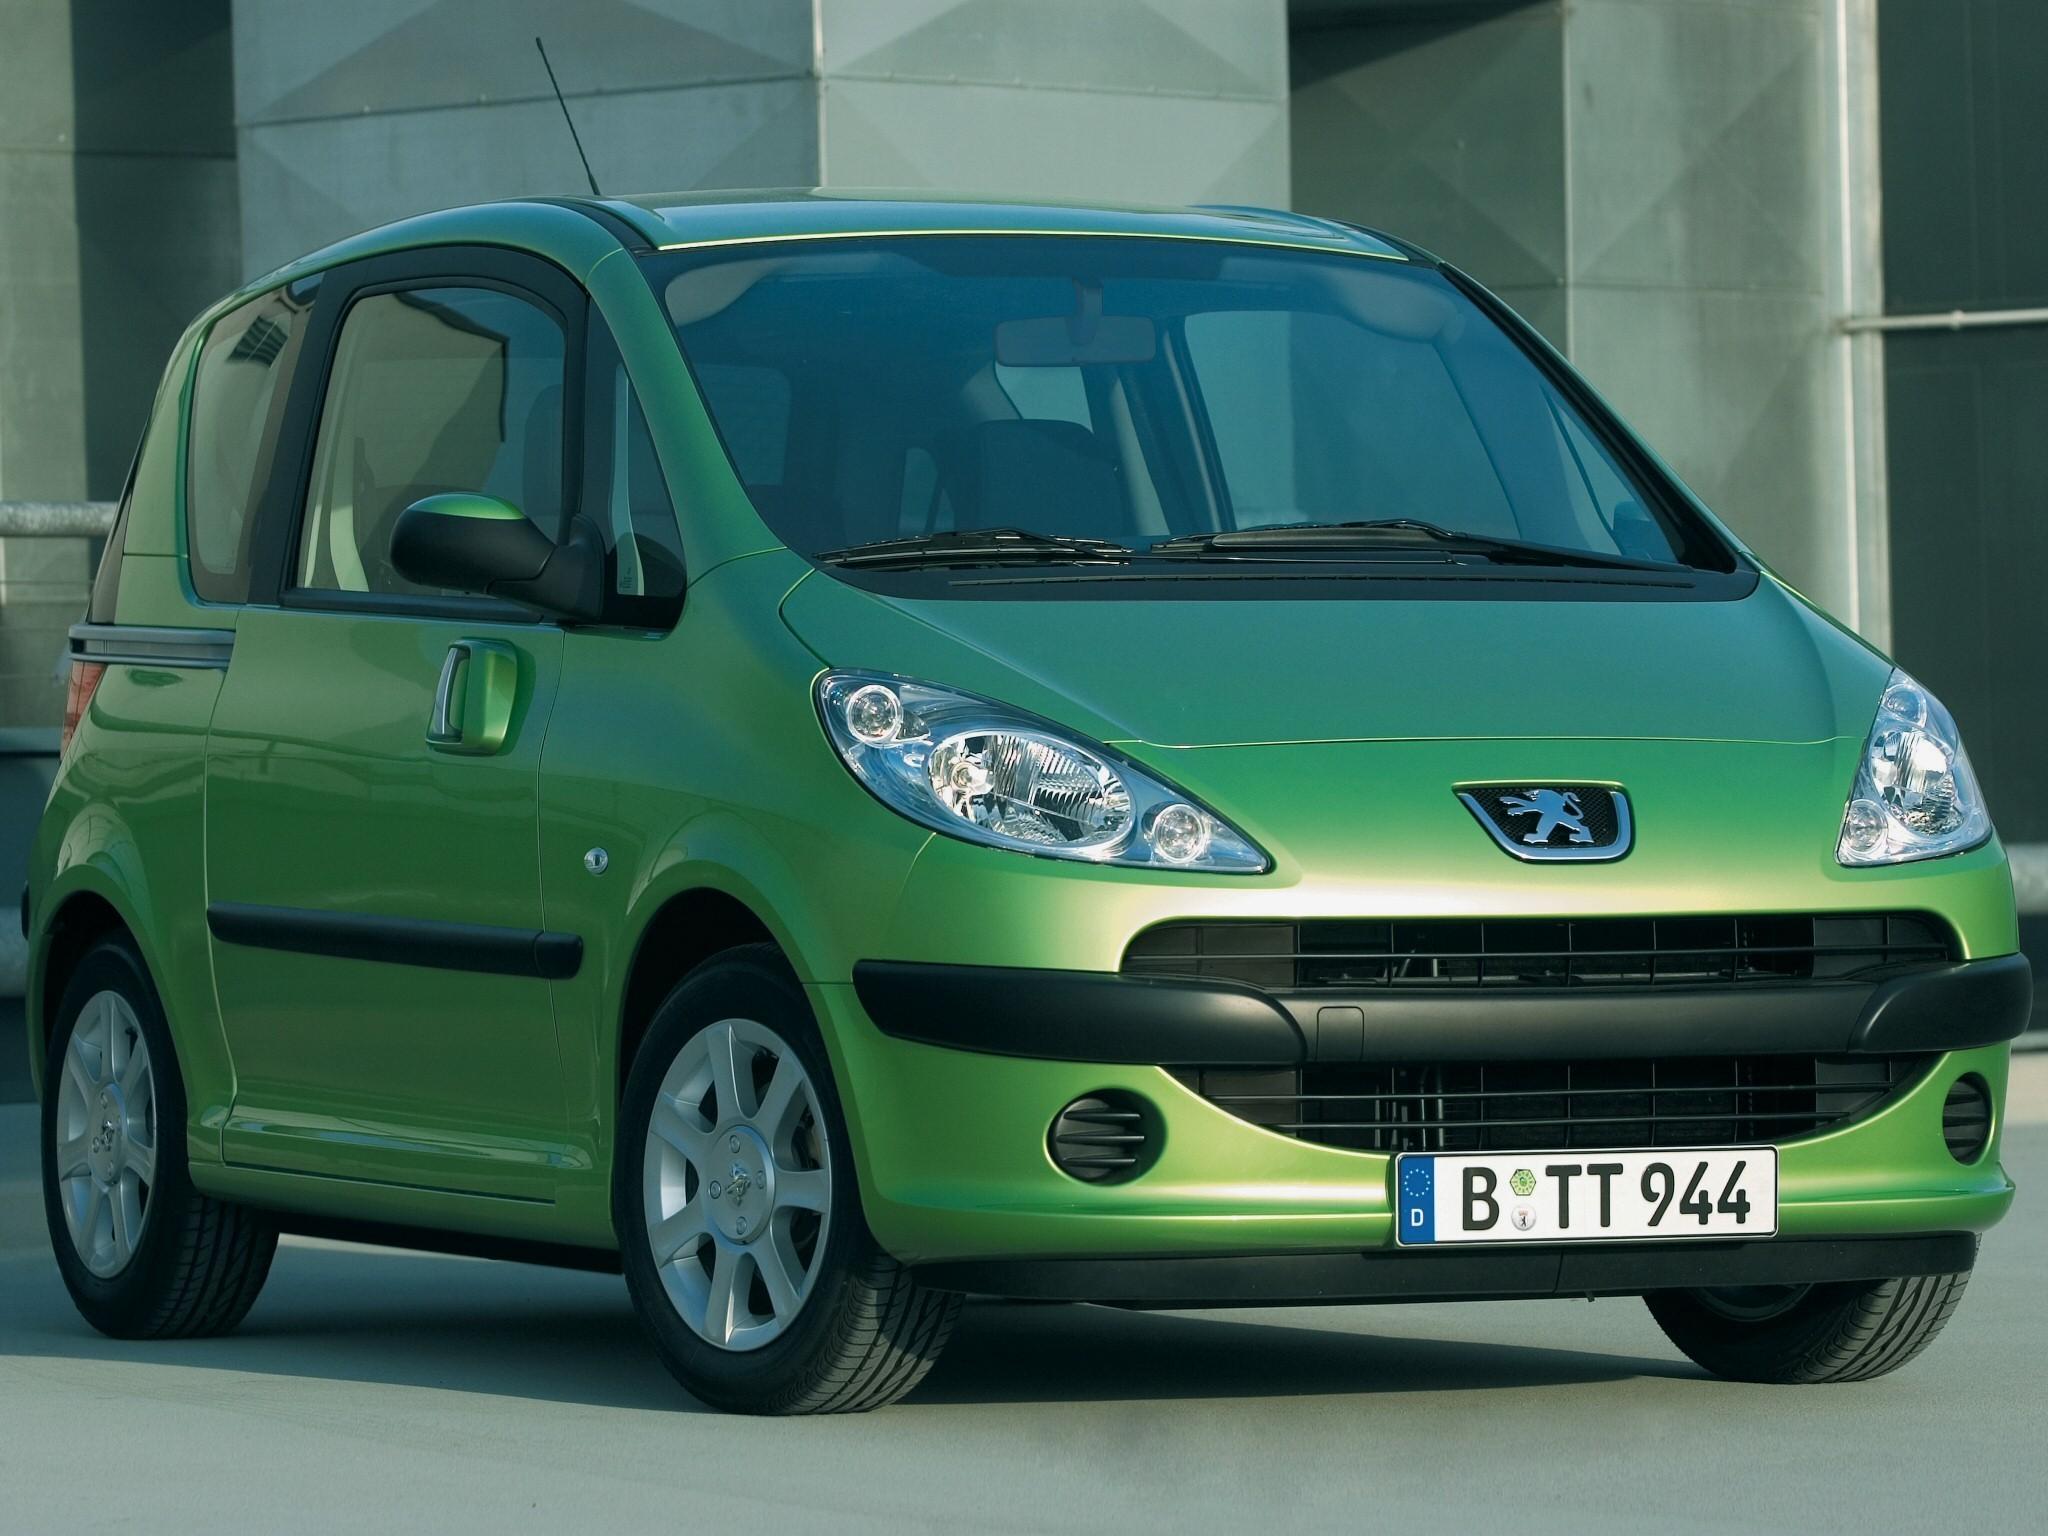 peugeot 1007 2007 2009 cars hdi auto autoevolution bestcarmag 2005 minivan